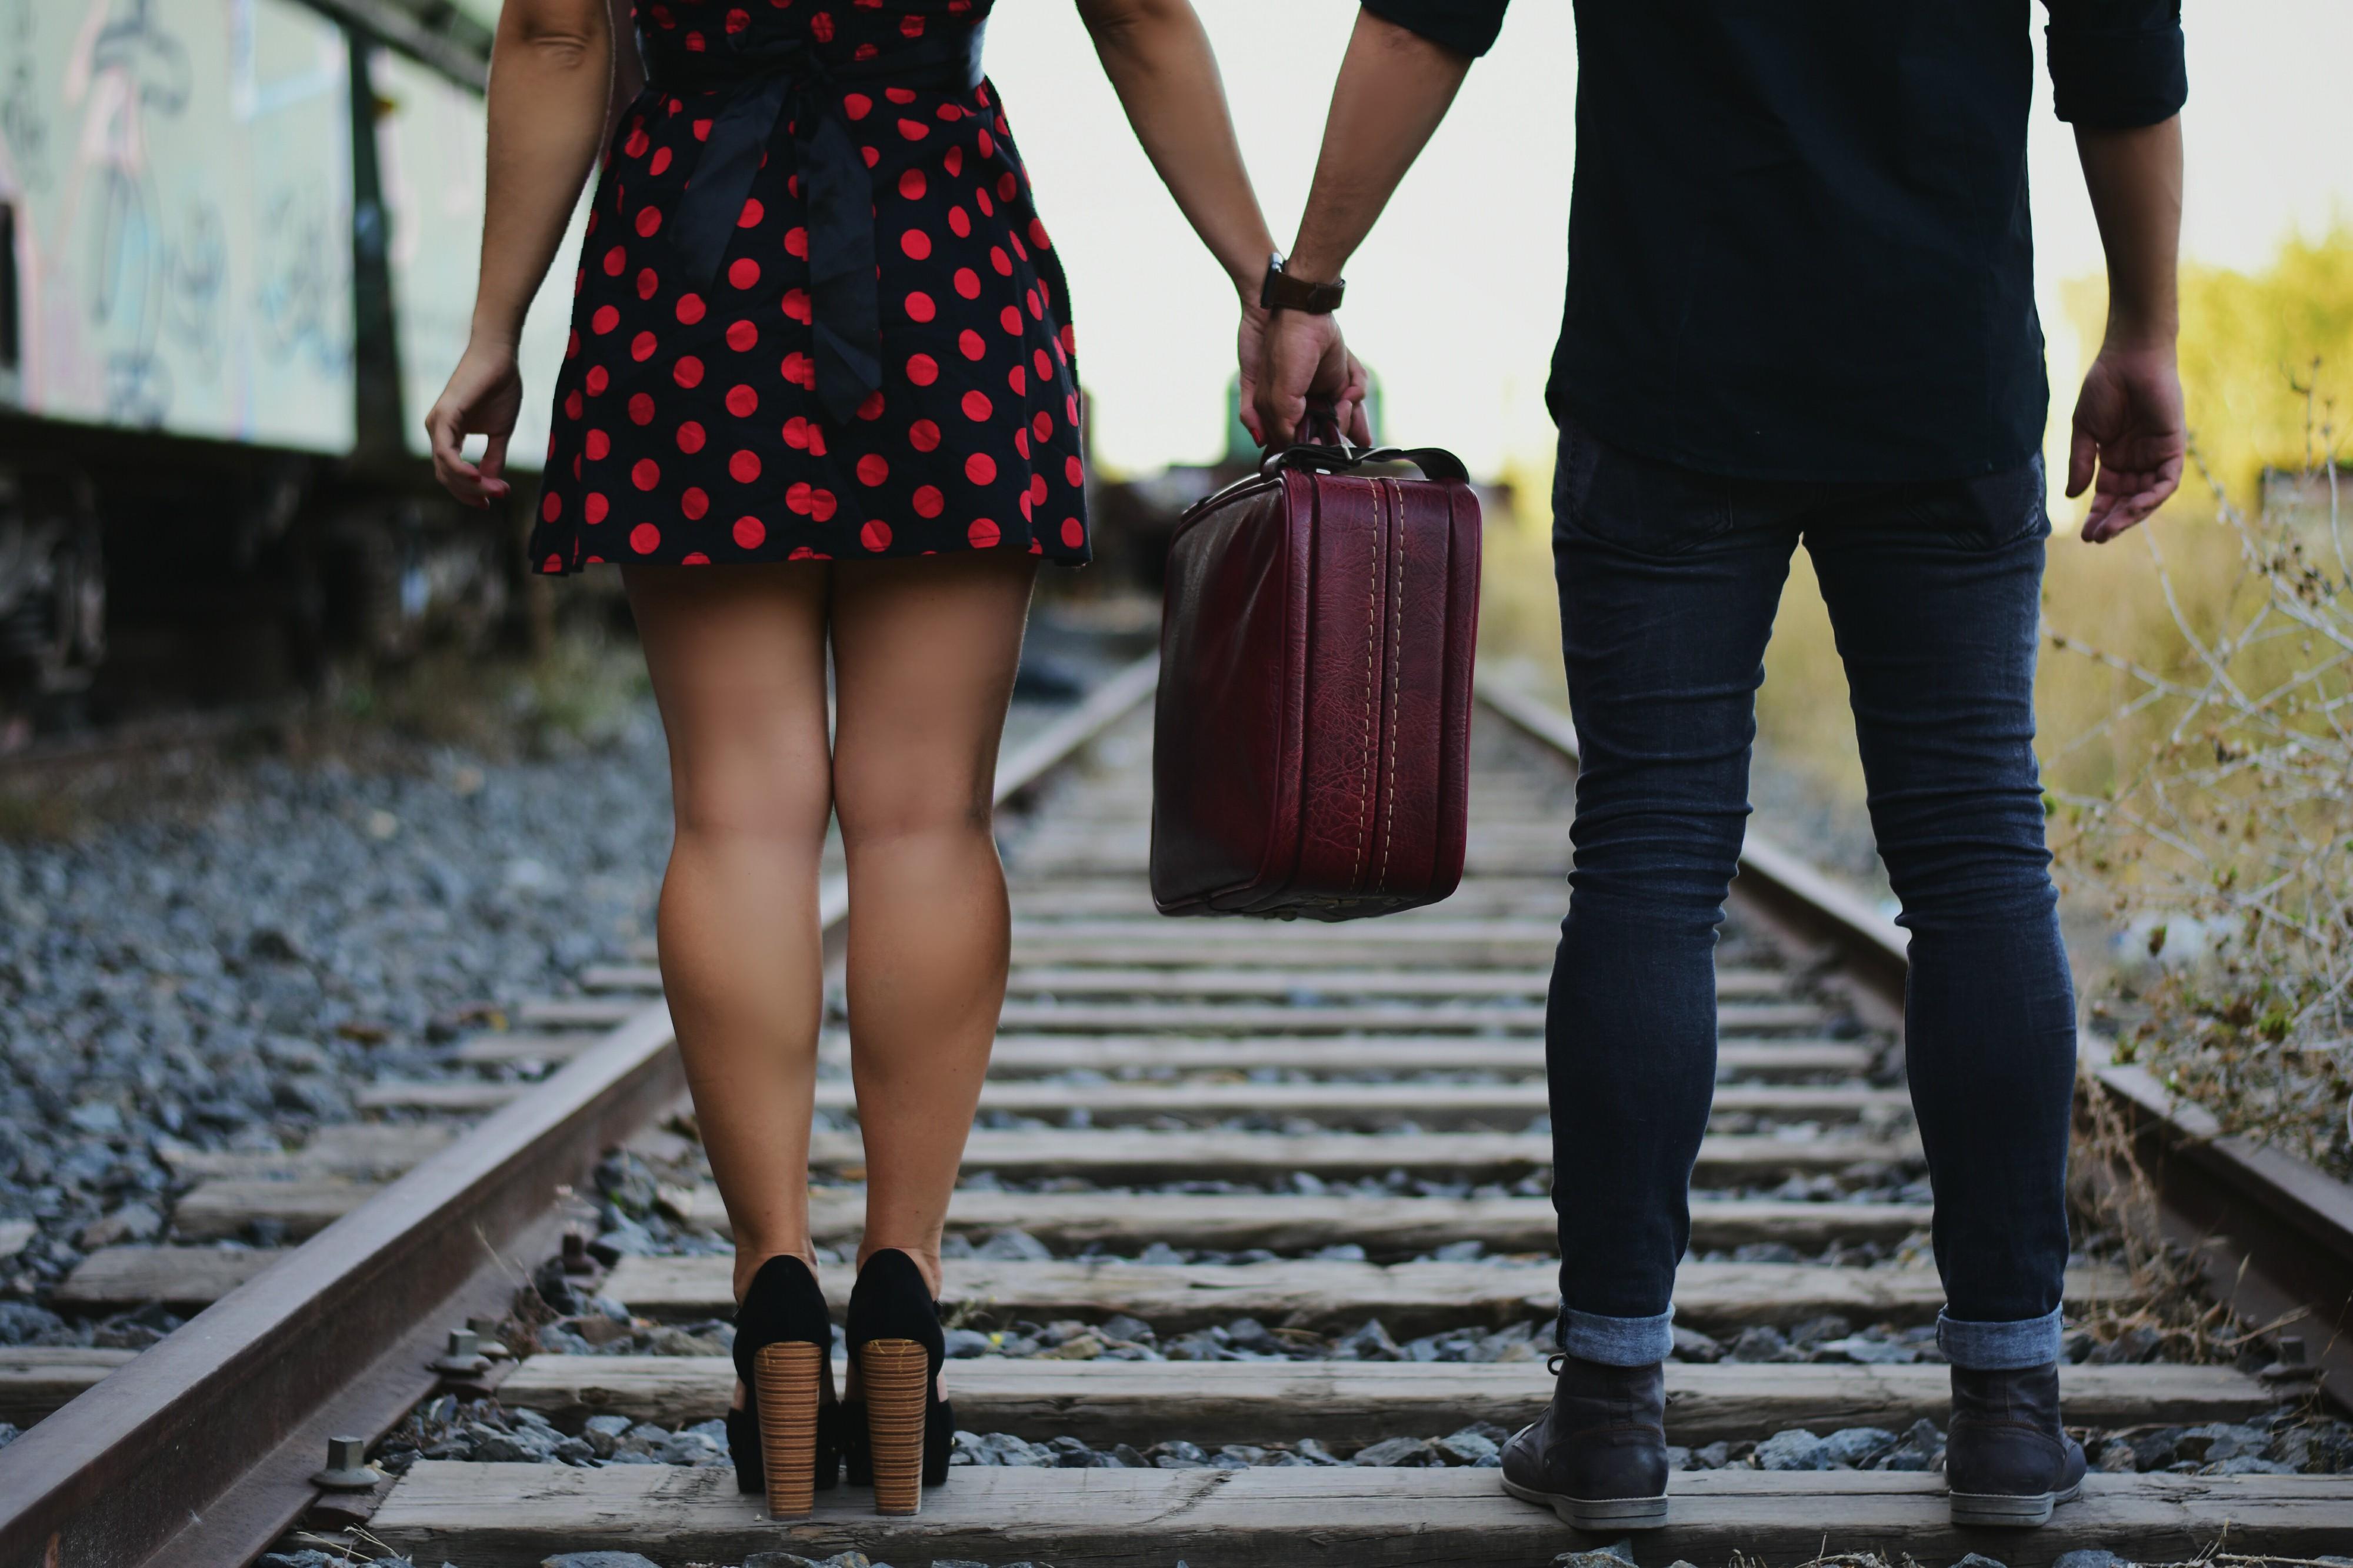 Blog-de-moda-ChicAdicta-fashionista-influencer-Chic-Adicta-retro-couple-fabbianifoto-ditrolio-maleta-vintage-PiensaenChic-Piensa-en-Chic